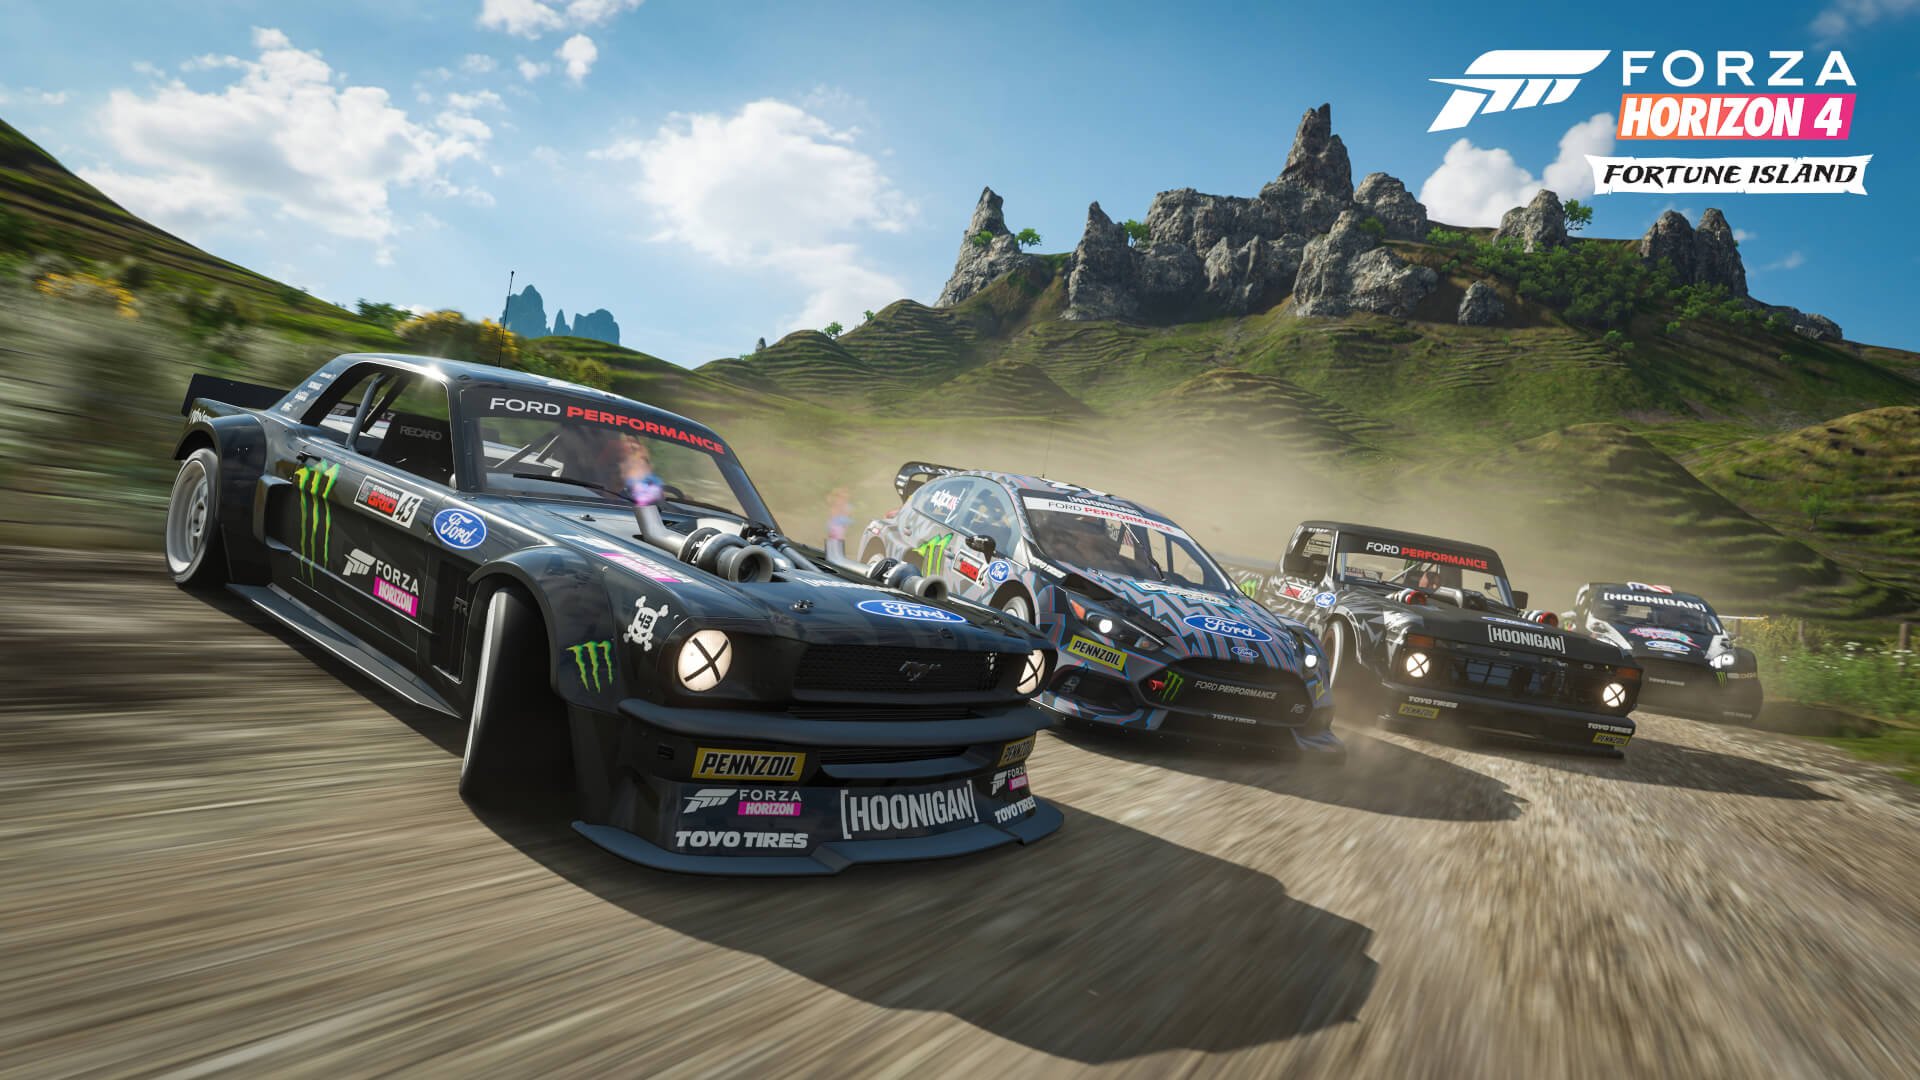 Forza Horizon 4 Fortune Island Achievements List – FullThrottle Media